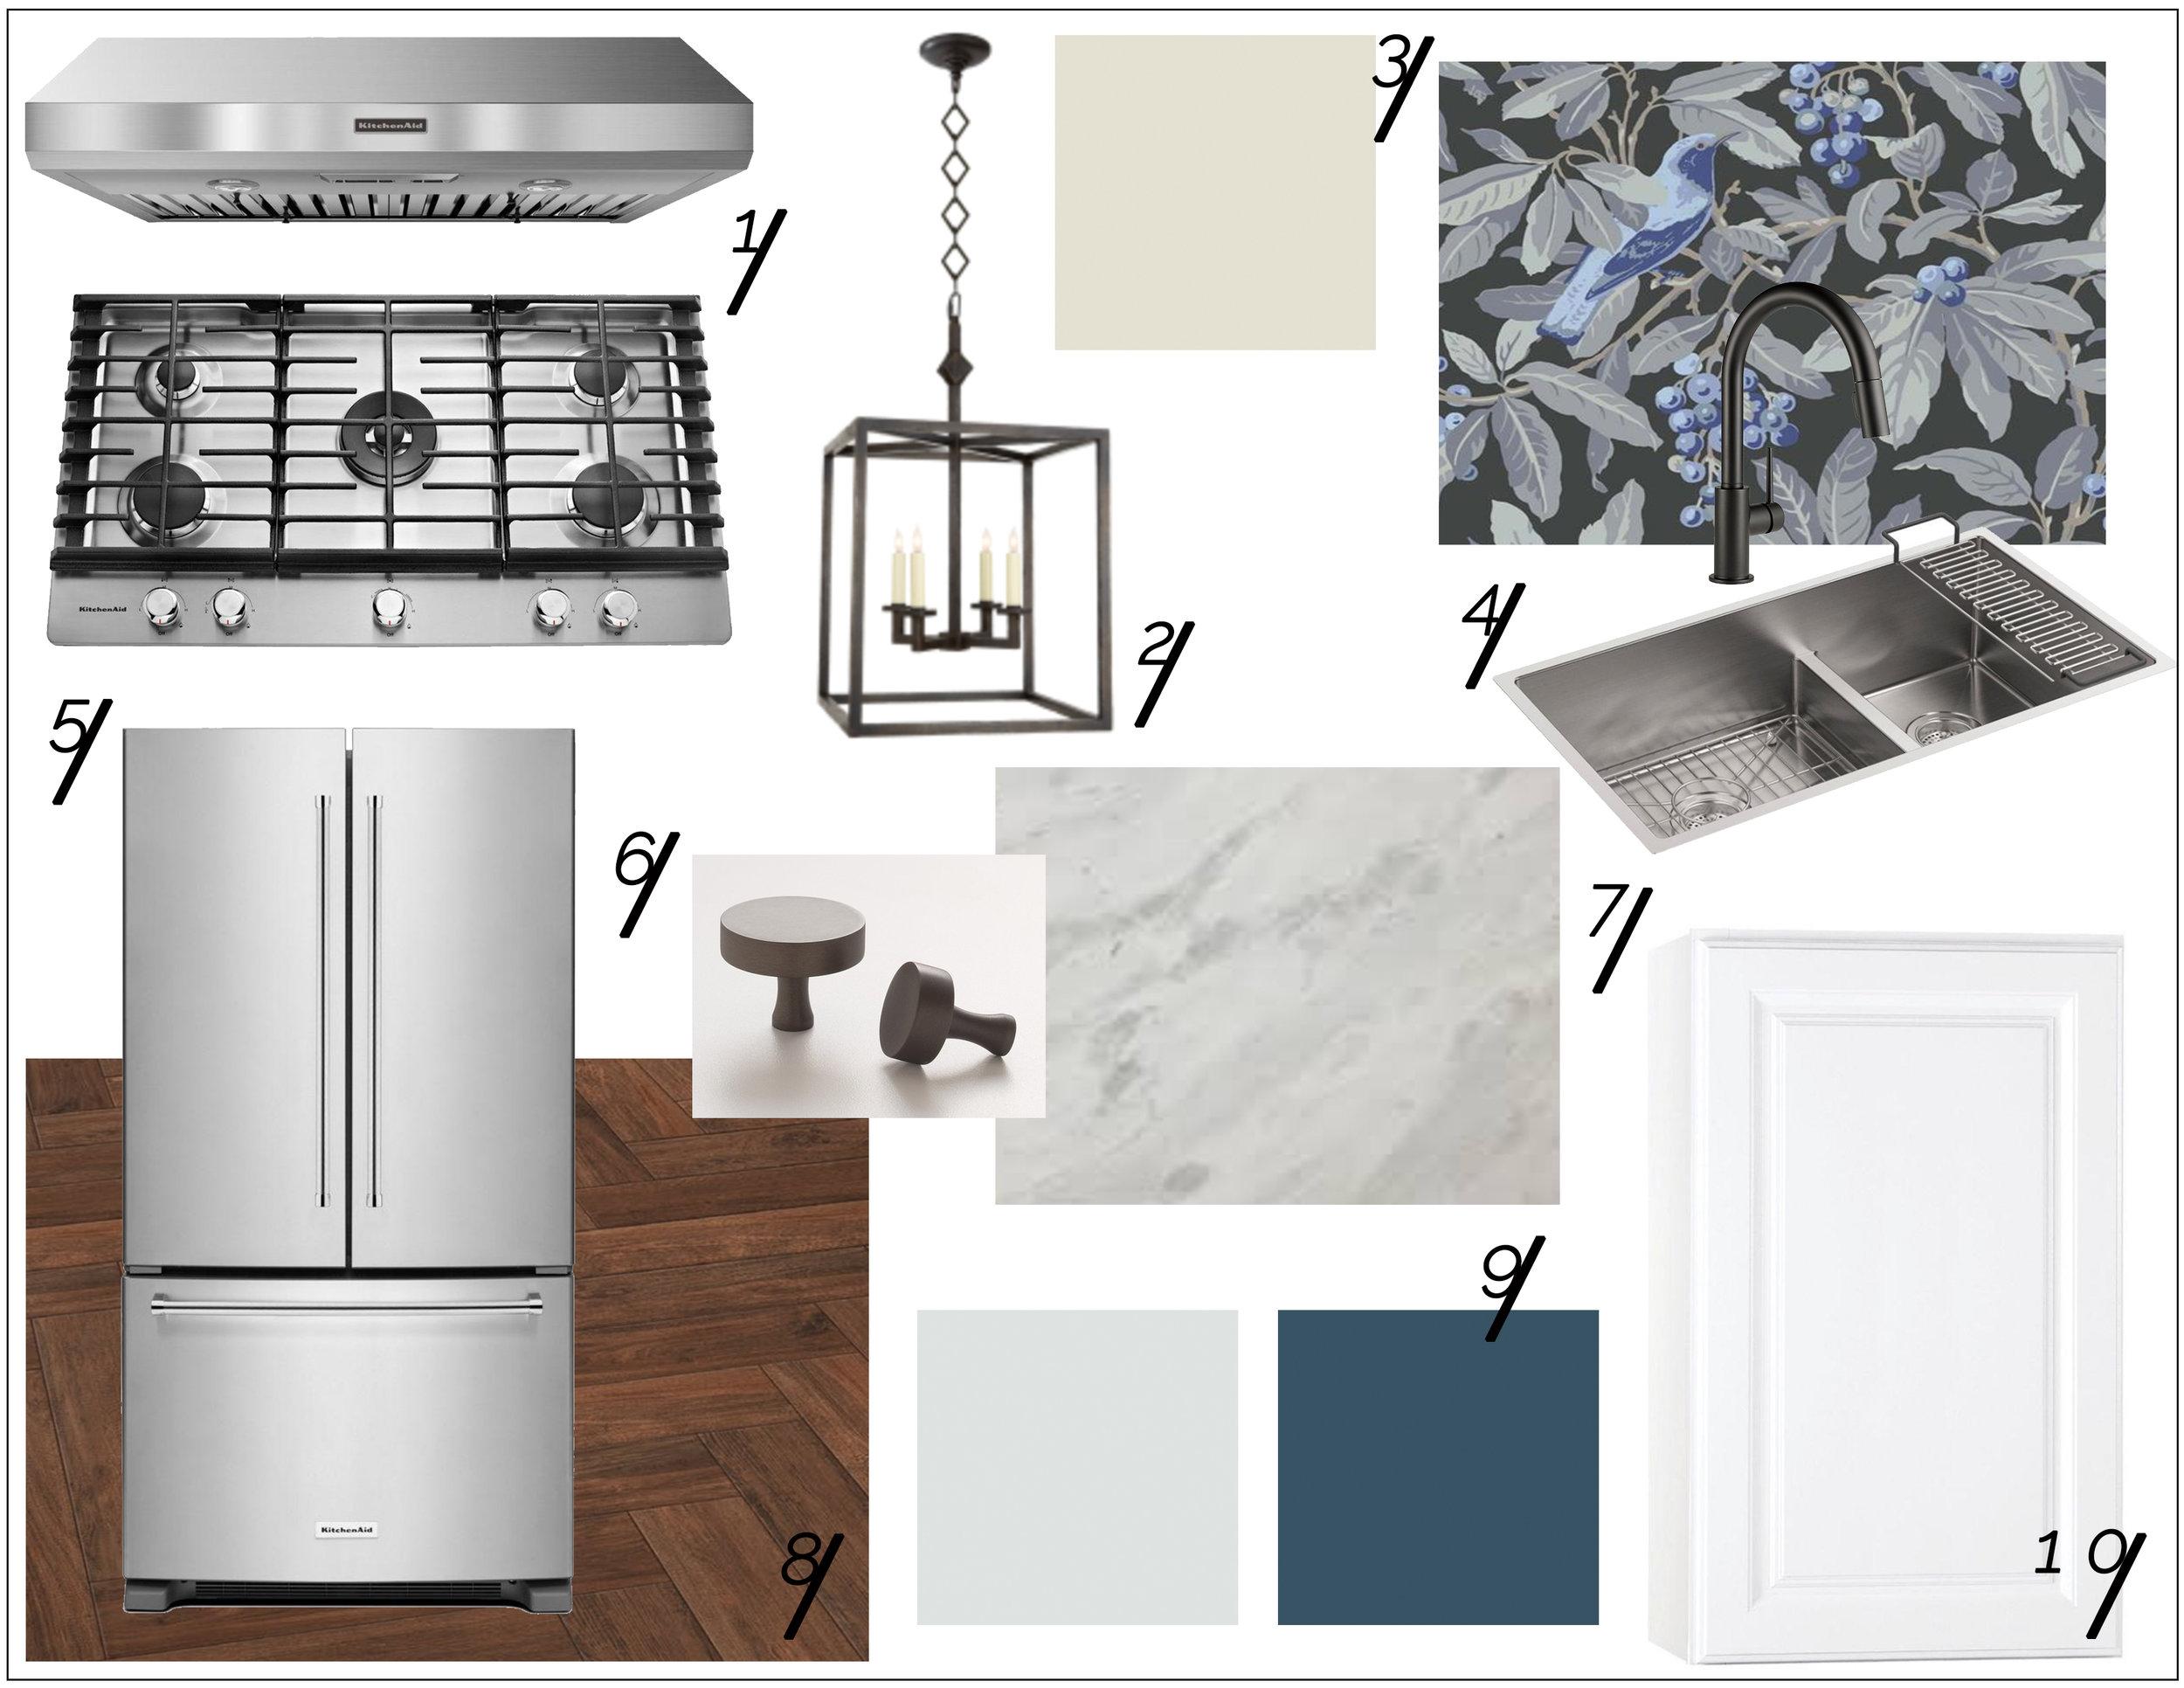 Classically Kitchen Shopping Guide  xo, Ebright Design